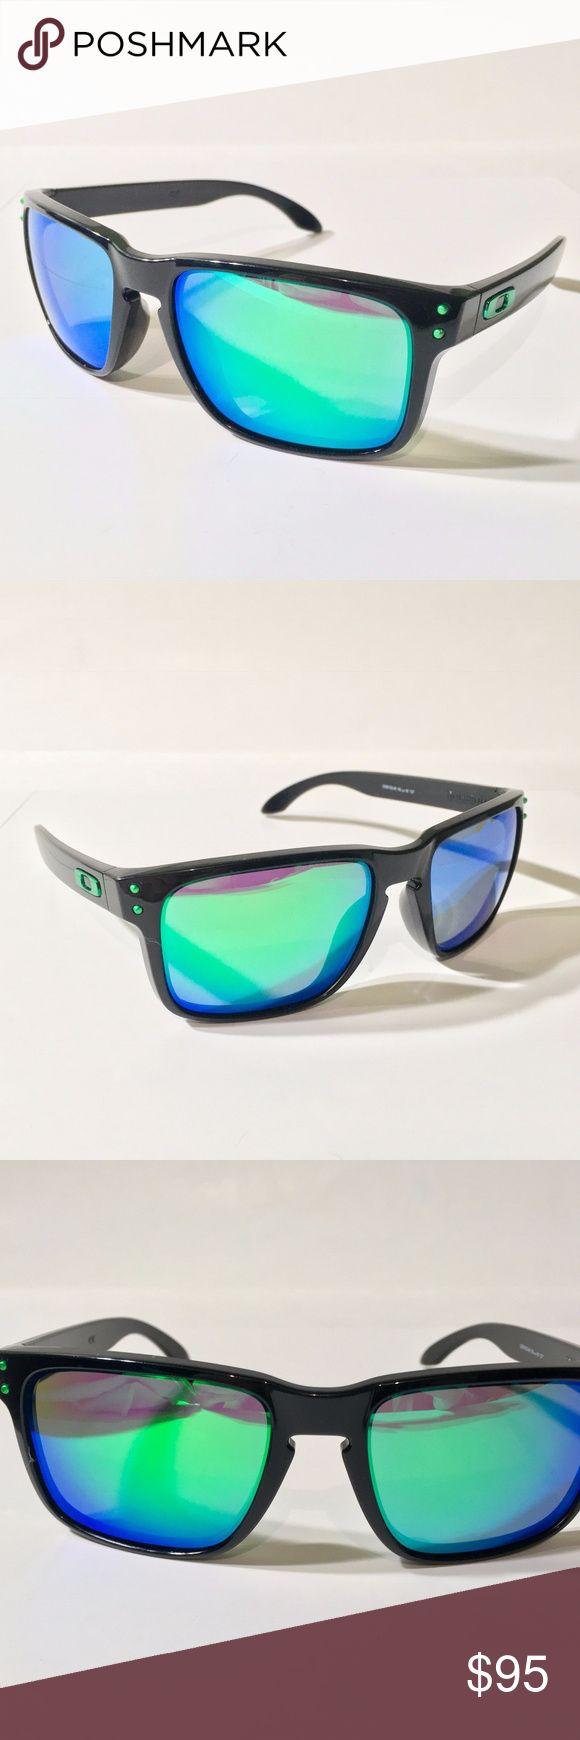 e5bcb80a64 Oakley Holbrook Motogp Limited Edition Emerald Iridium Polished ...